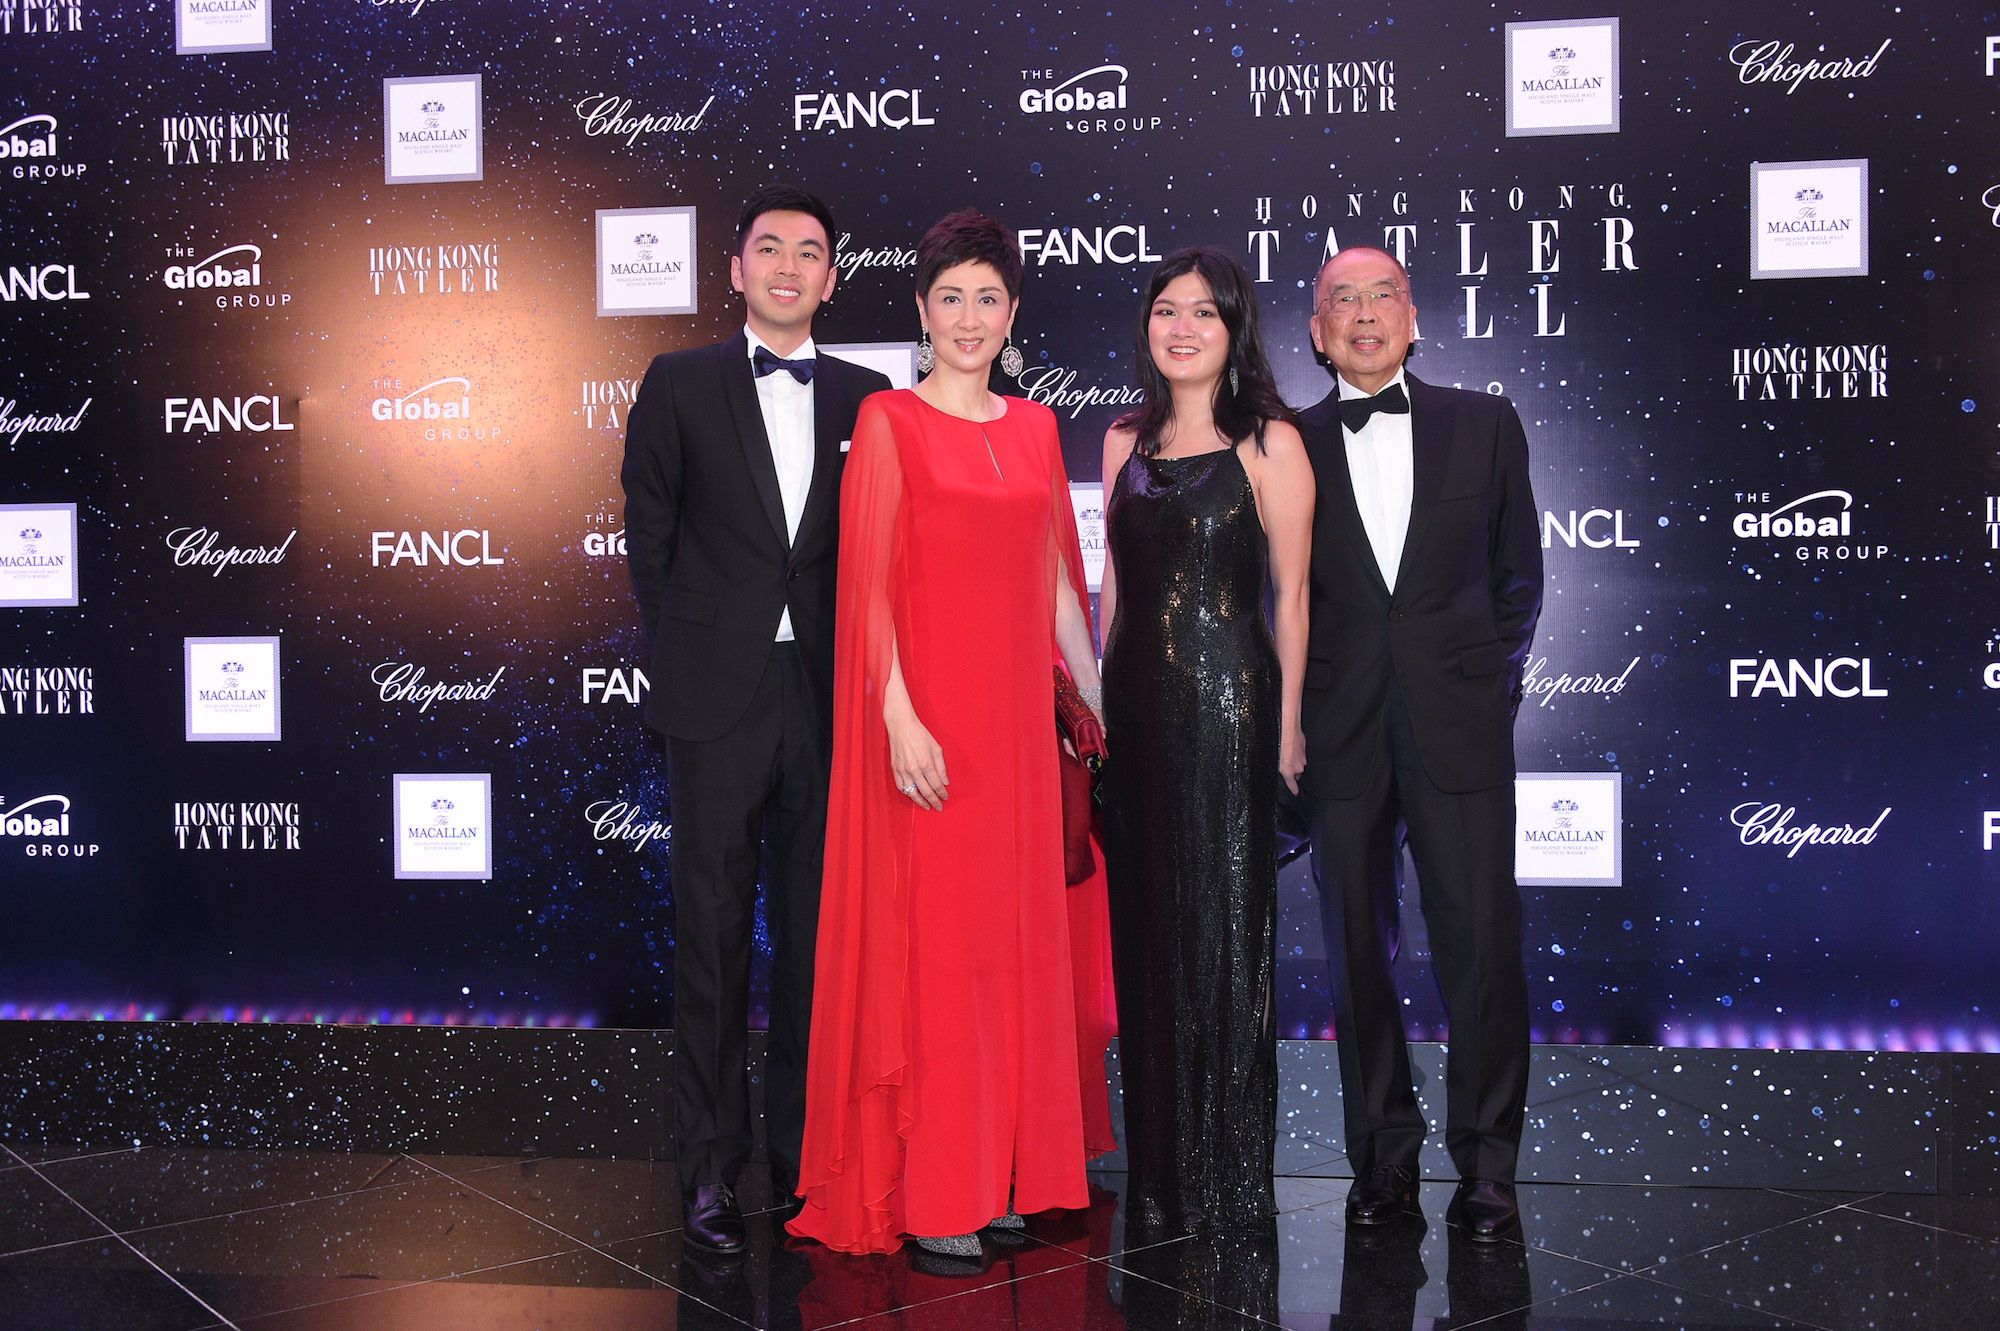 Adrian Cheung, Michelle Ong-Cheung, Jennifer Cheung, David Cheung